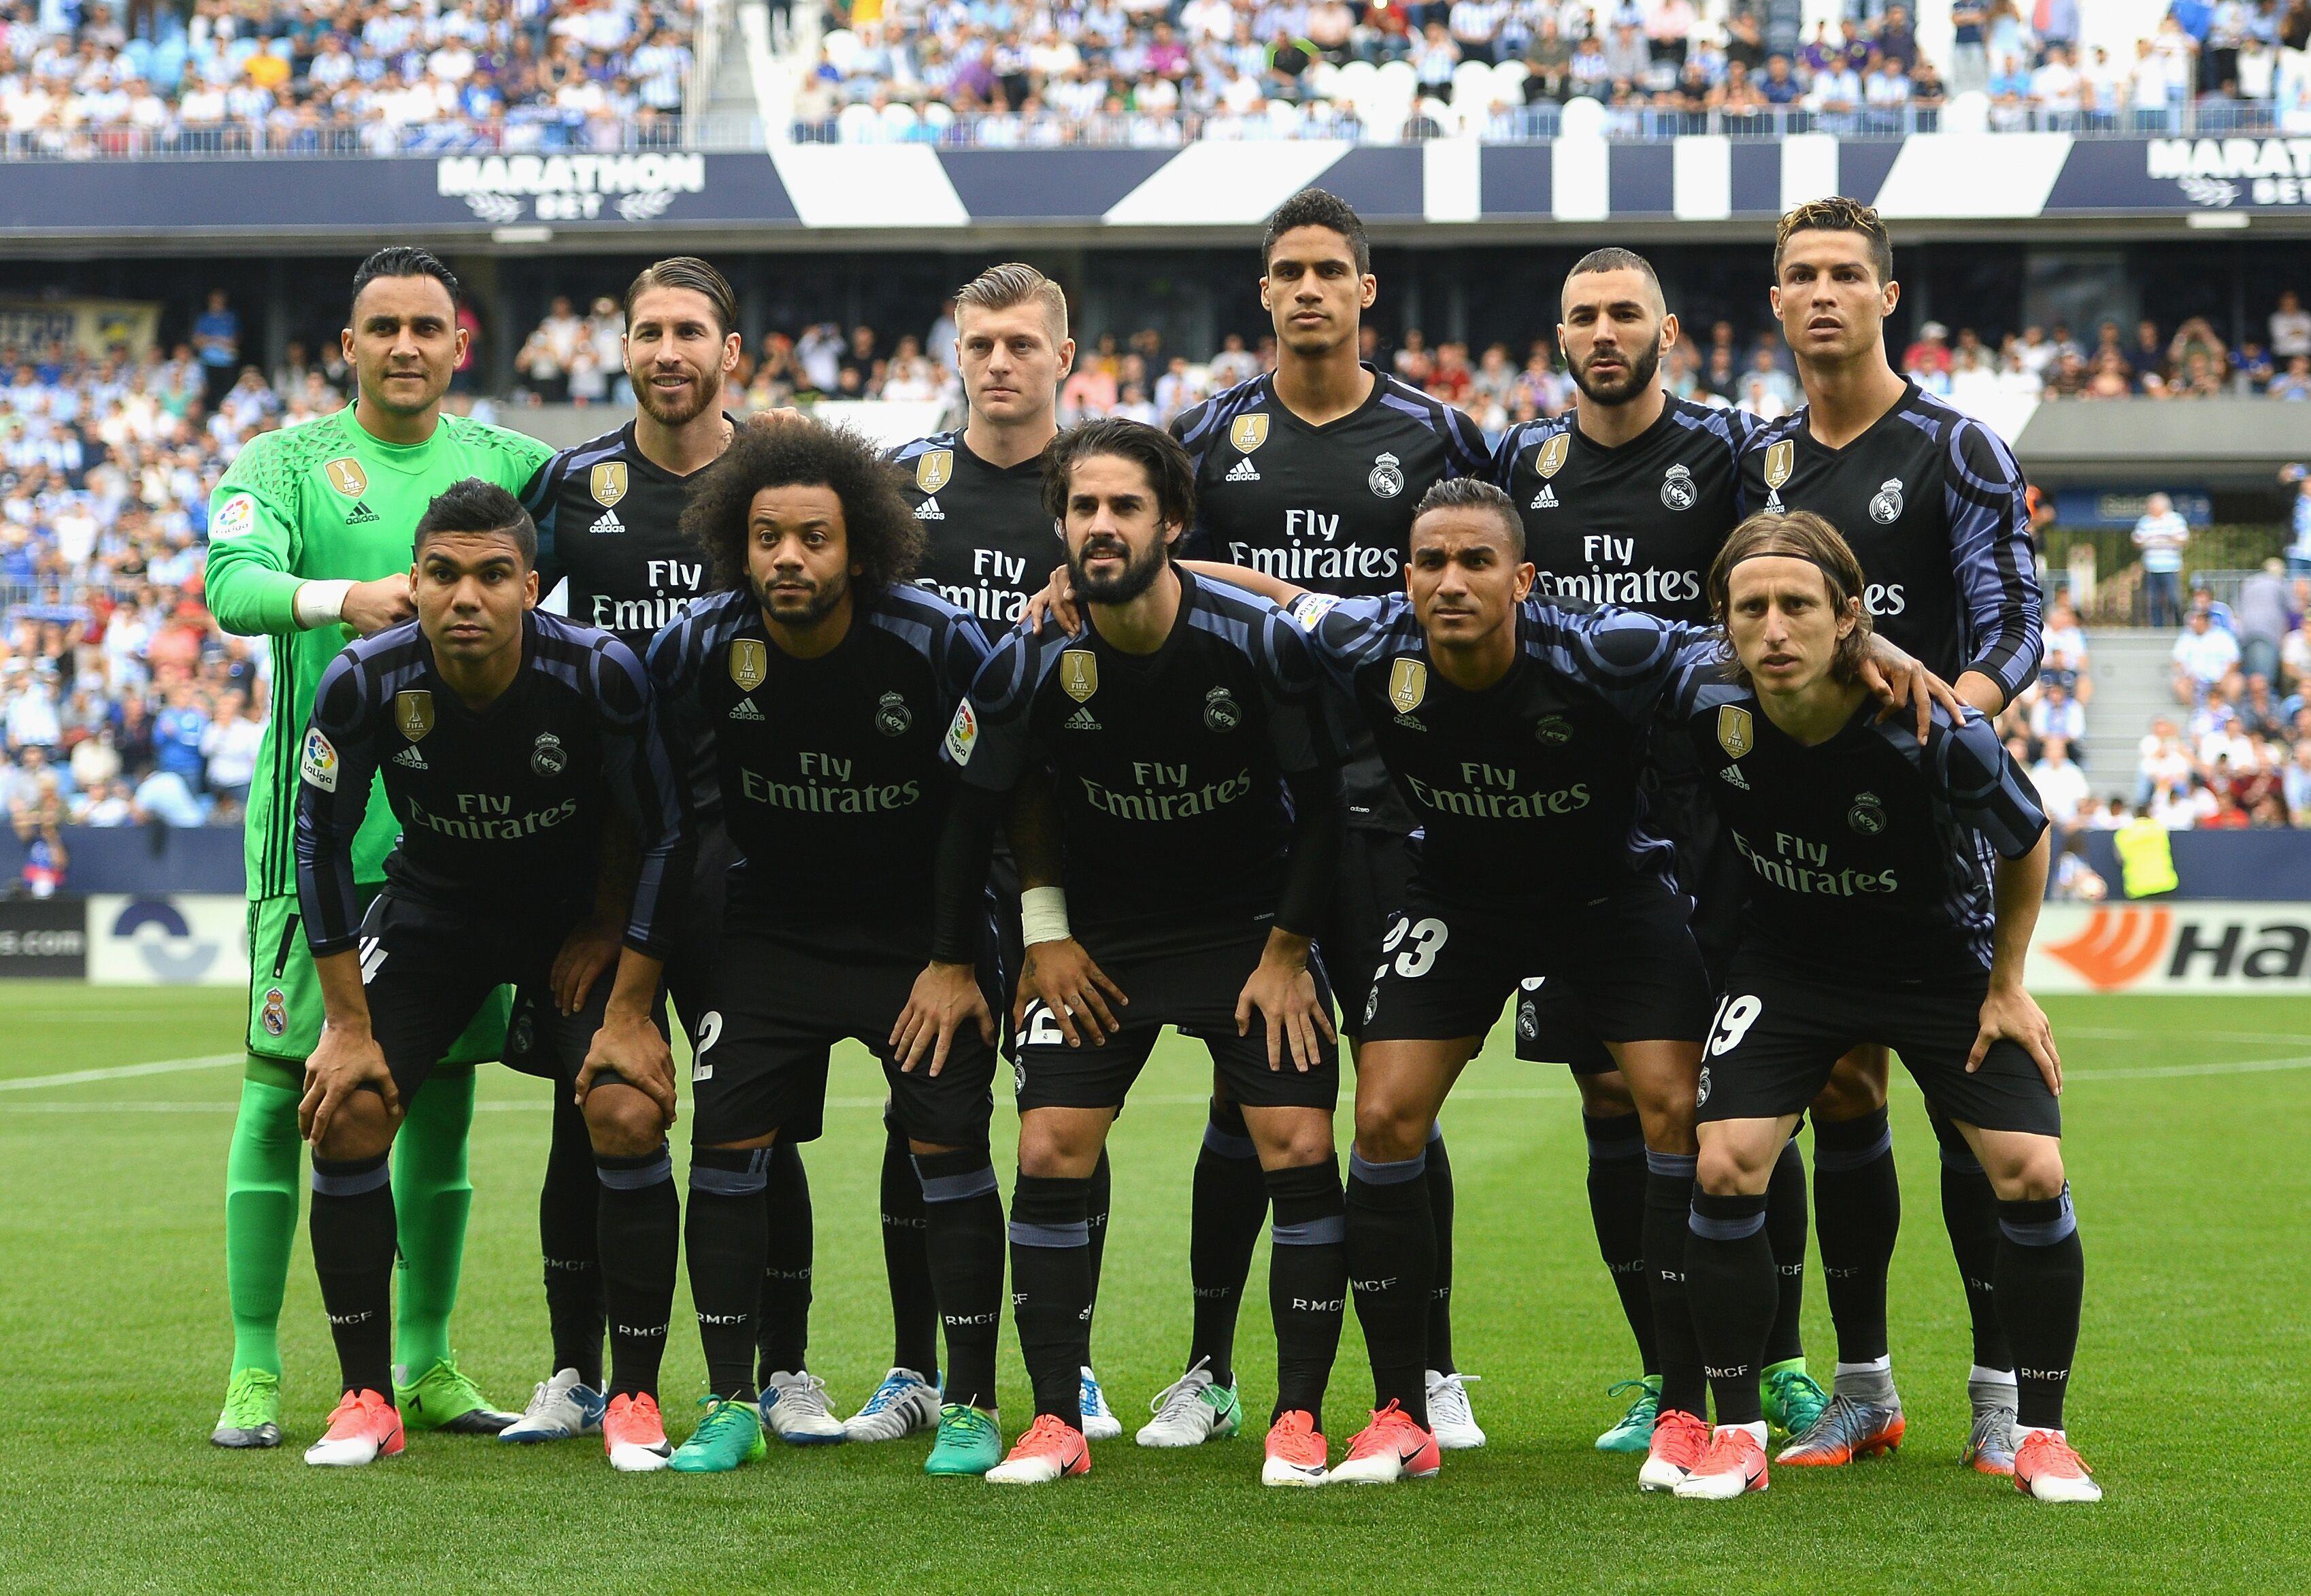 2 Real Madrid 2017 La Liga: Champions At Last: Real Madrid Player Ratings Vs Malaga